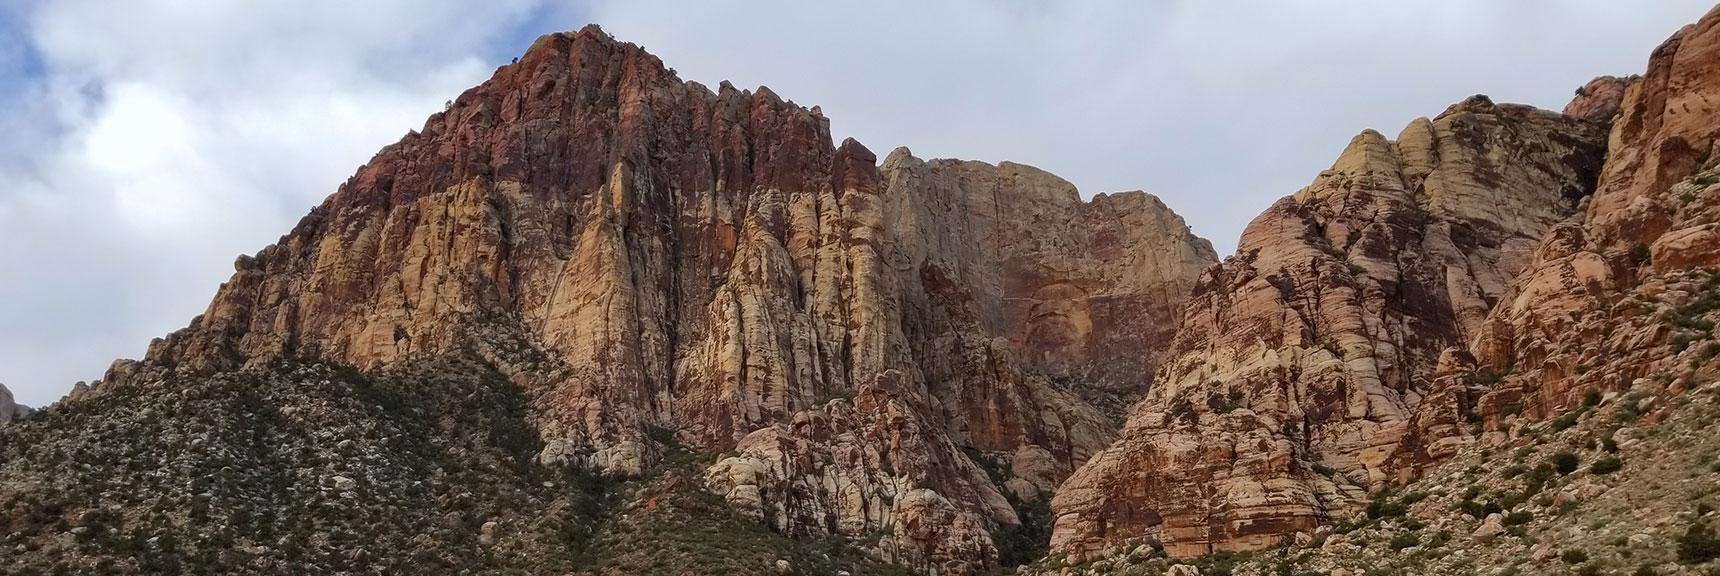 Rainbow Mountain and Rainbow Wall, Rainbow Mountain Wilderness, Nevada